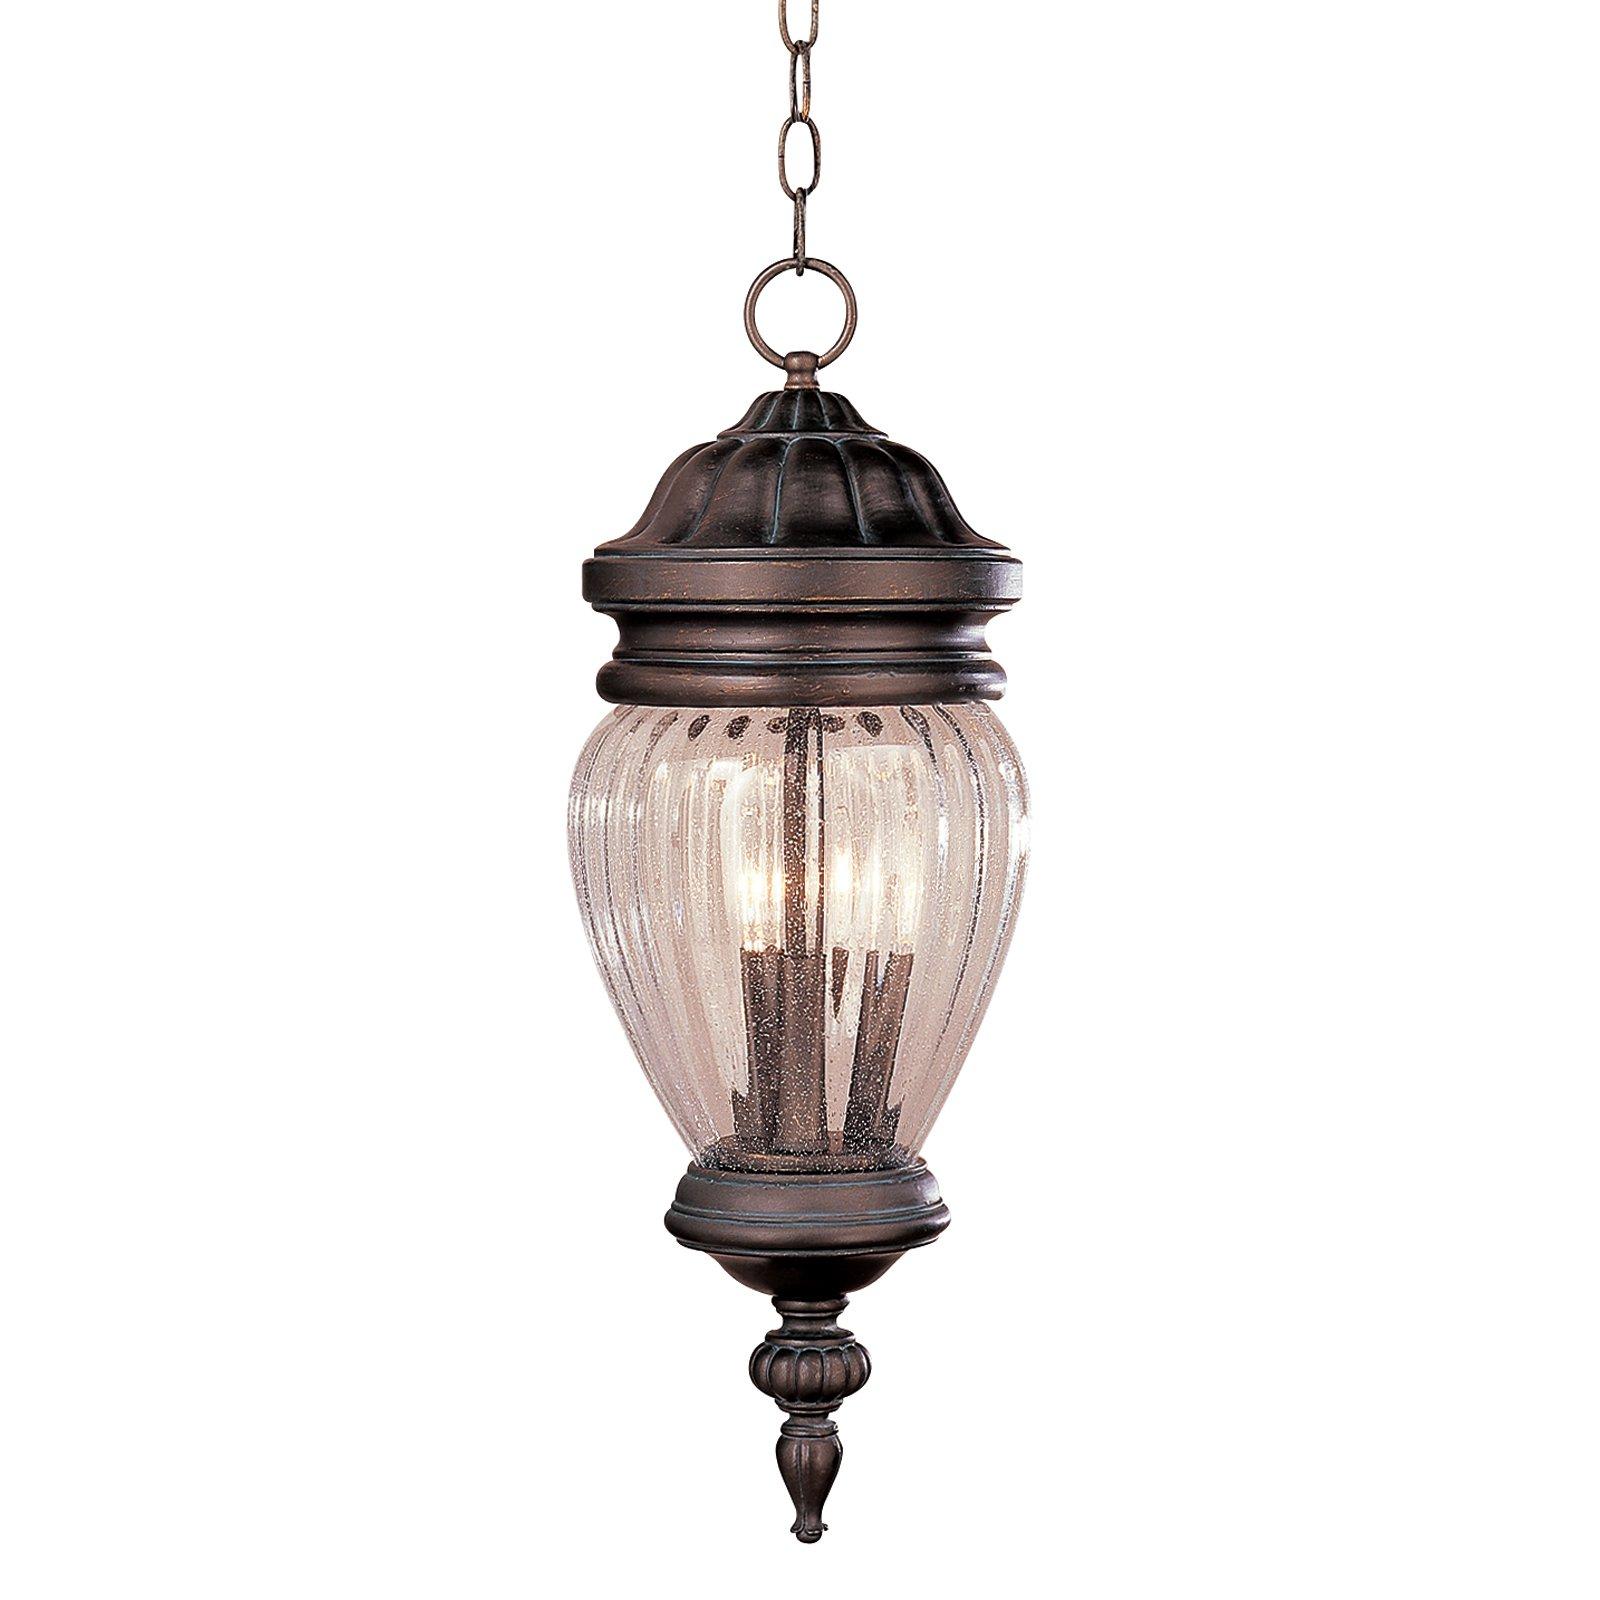 Bel Air Johnson Lake Outdoor Hanging Light - 21.75H in.-Antique Pewter